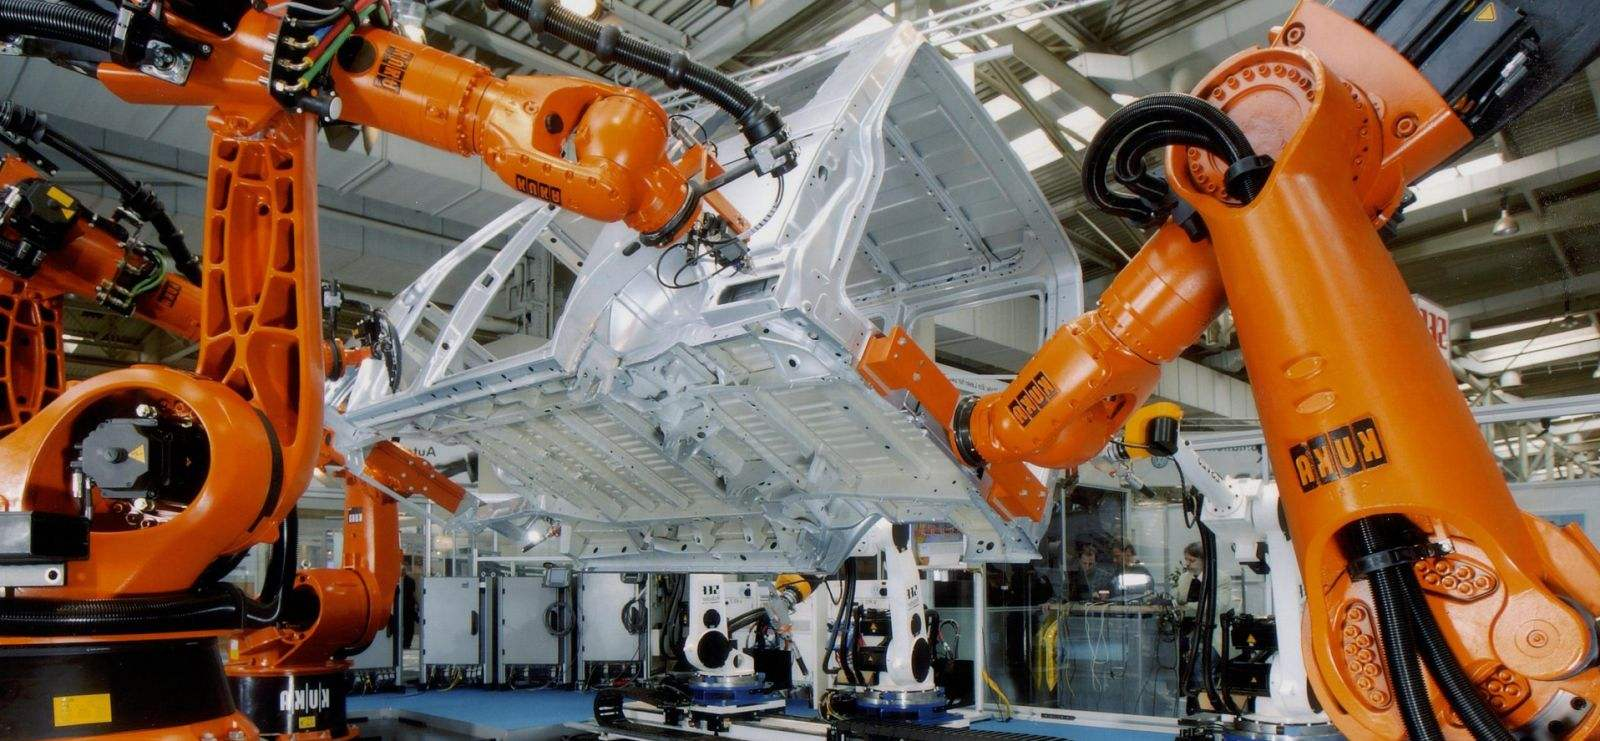 KUKA庫卡機器人搬運汽車  X Robotics愛科思機器人x-ltd.com